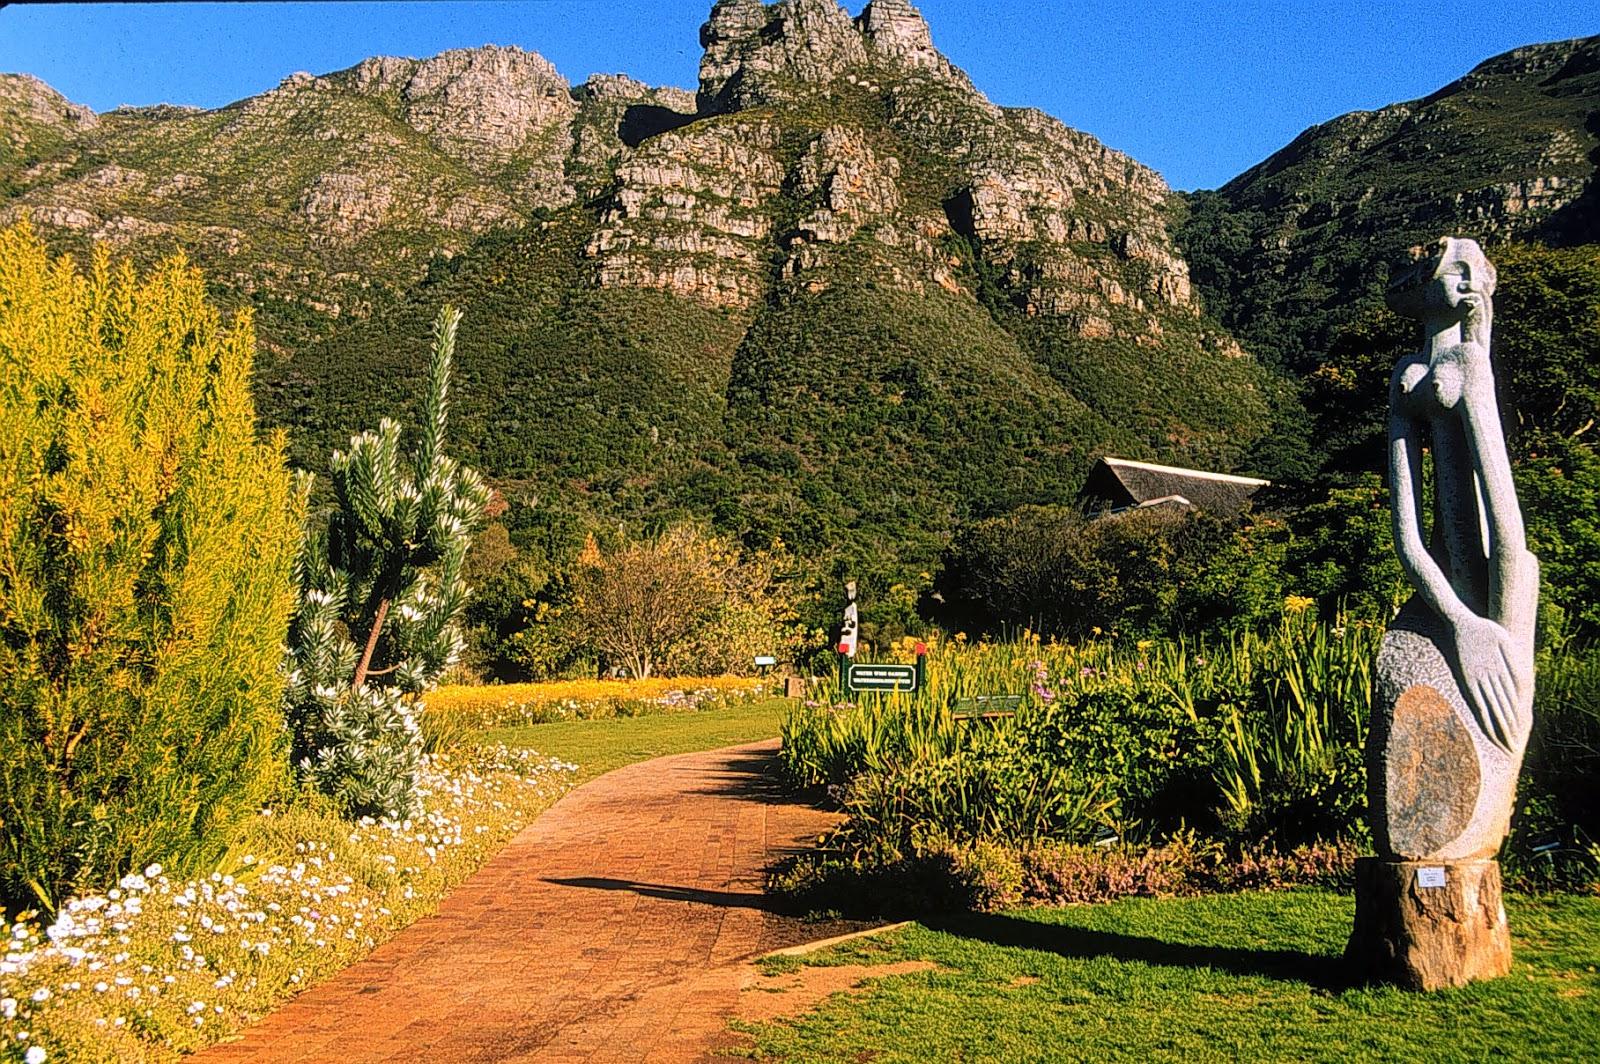 I Brake for Wildflowers!: South Africa 1. Kirstenbosch